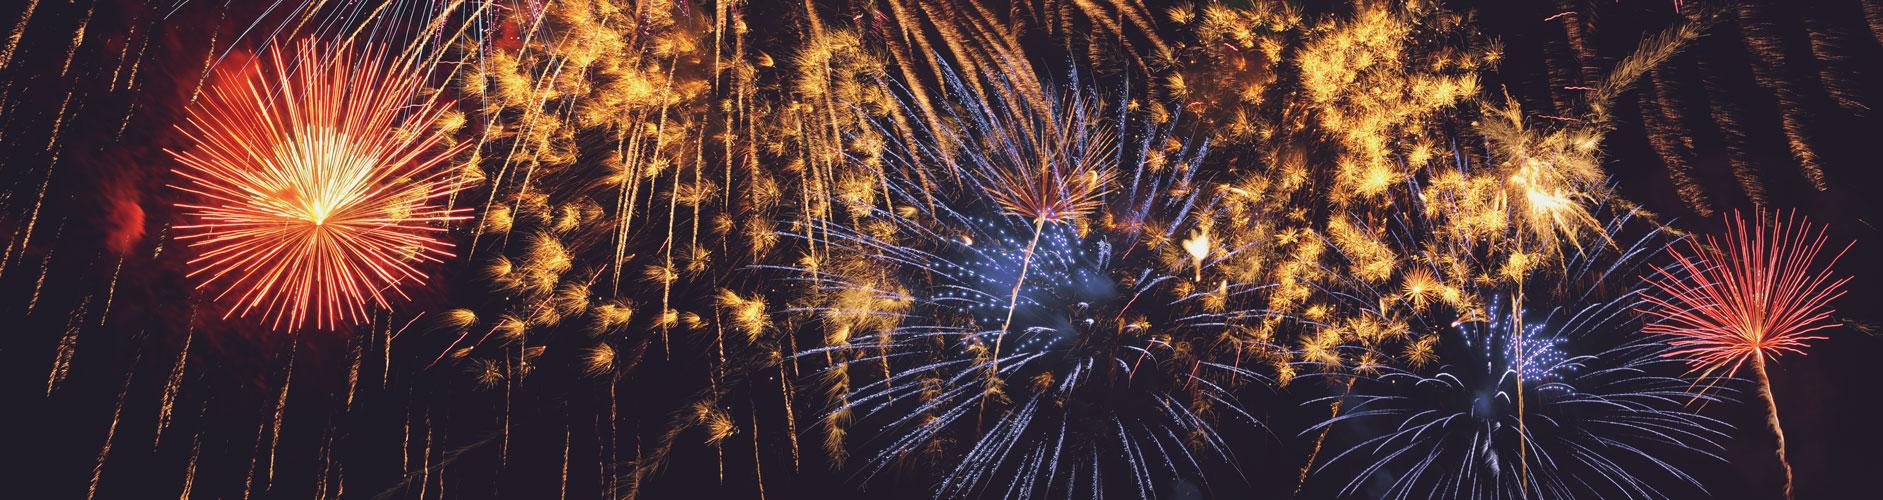 Fireworks_62918_Blog.jpg